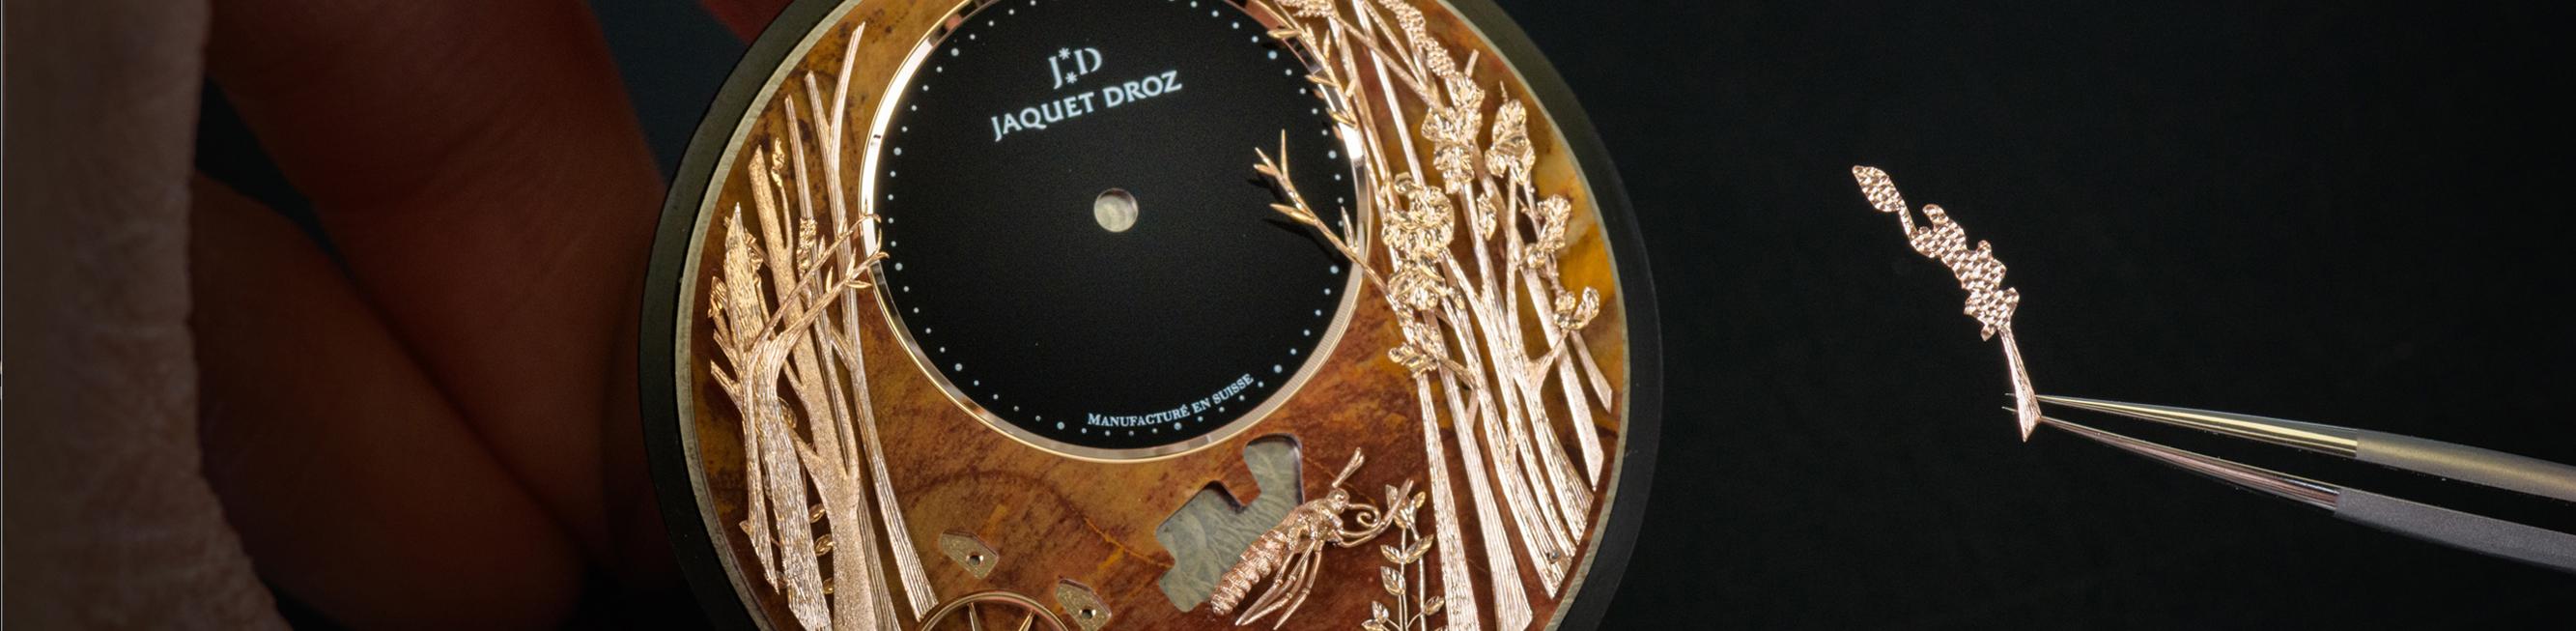 Jaquet Droz 2020 Novelties Exhibition 5th - 18th November - October 2020 News article hero image